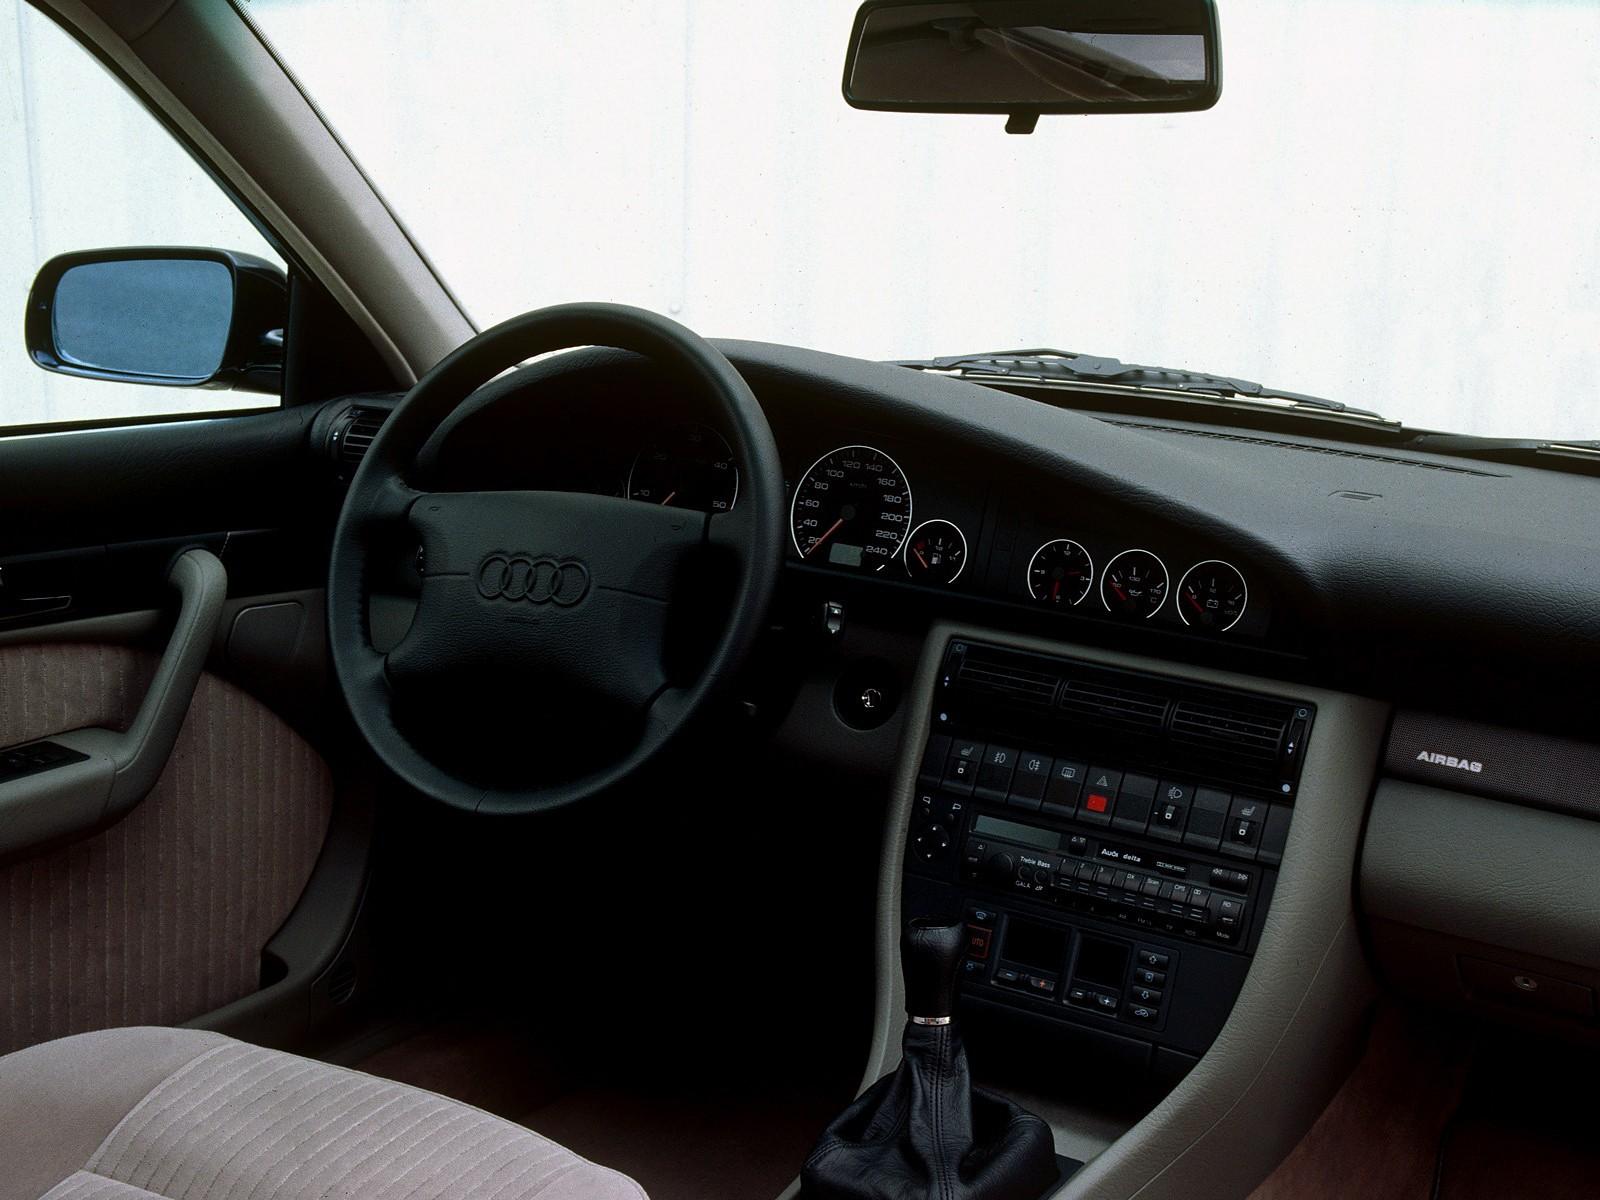 Audi S6 I (C4) 1994 - 1997 Sedan #5